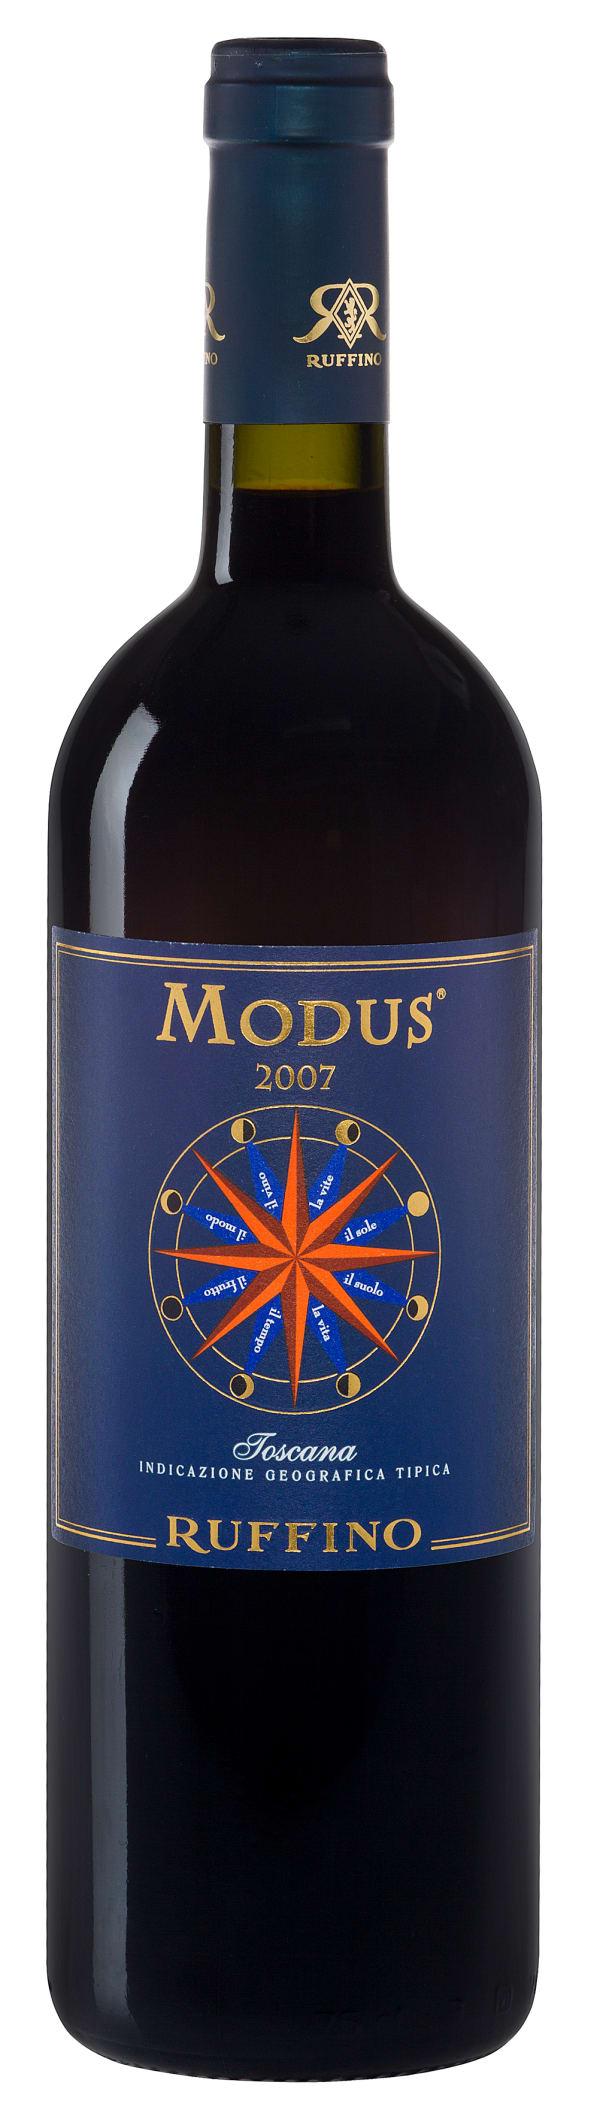 Ruffino Modus 2013